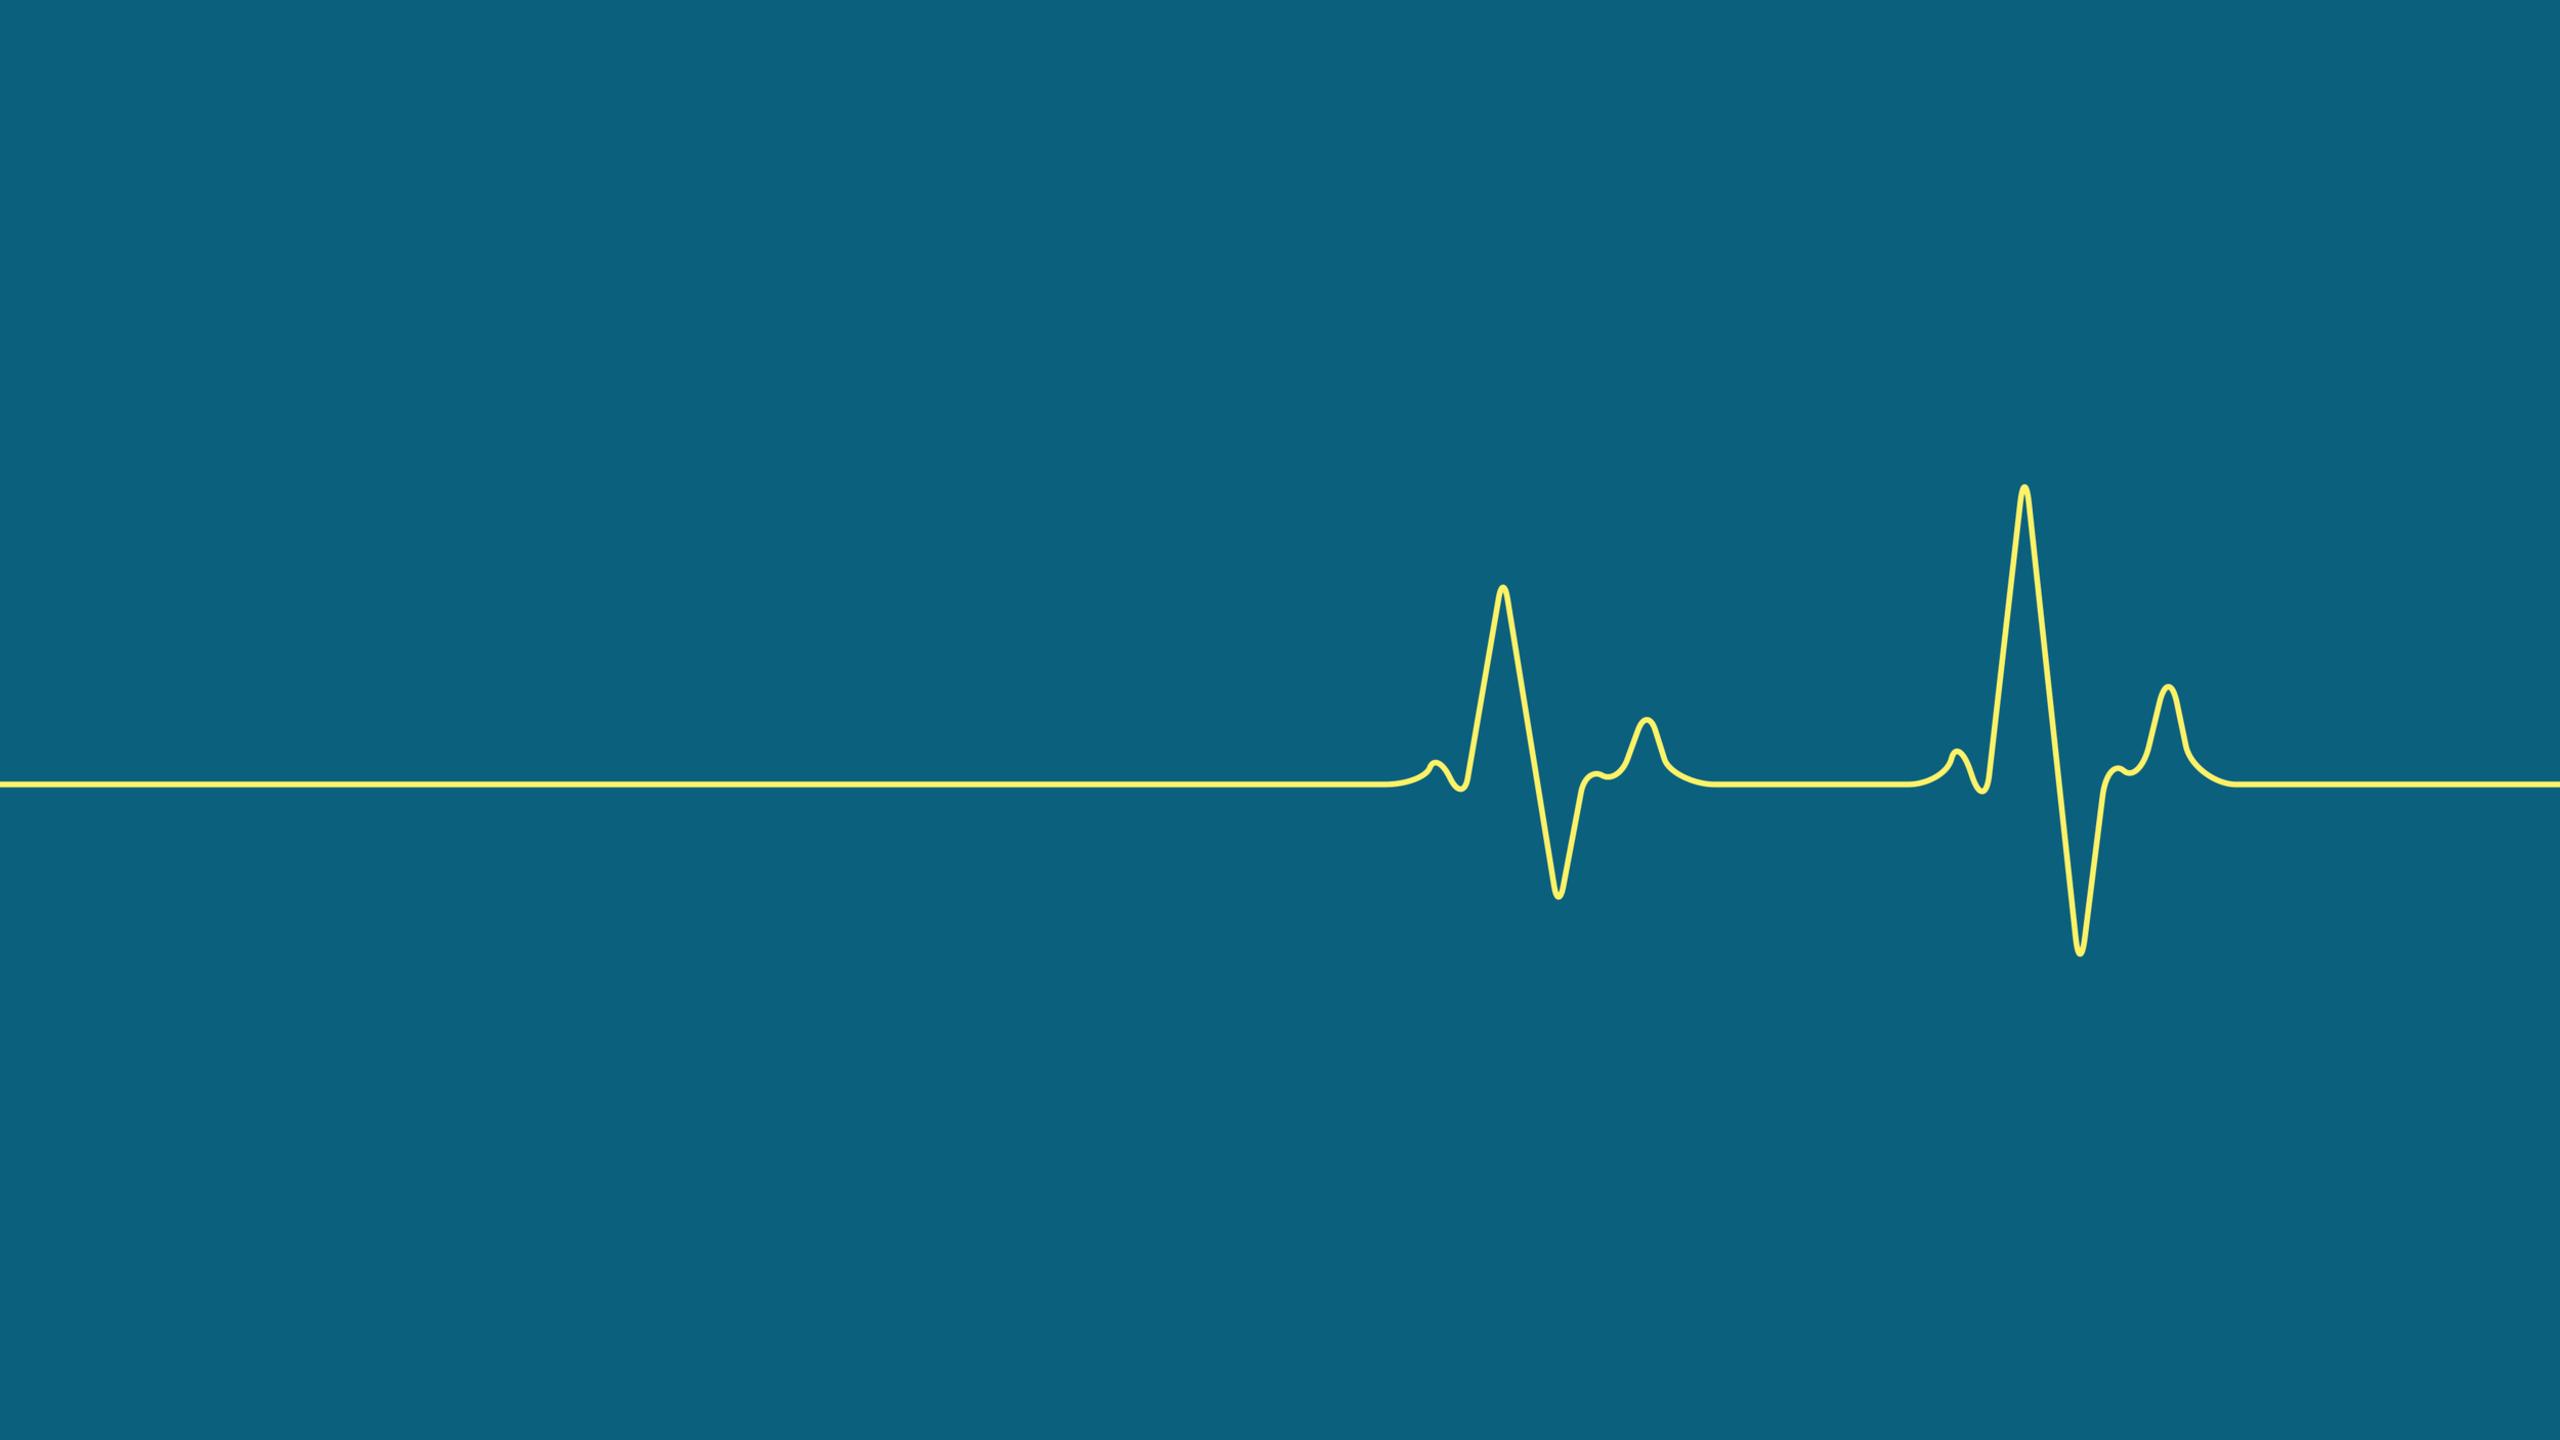 2560x1440 music heartbeat 1440p resolution hd 4k